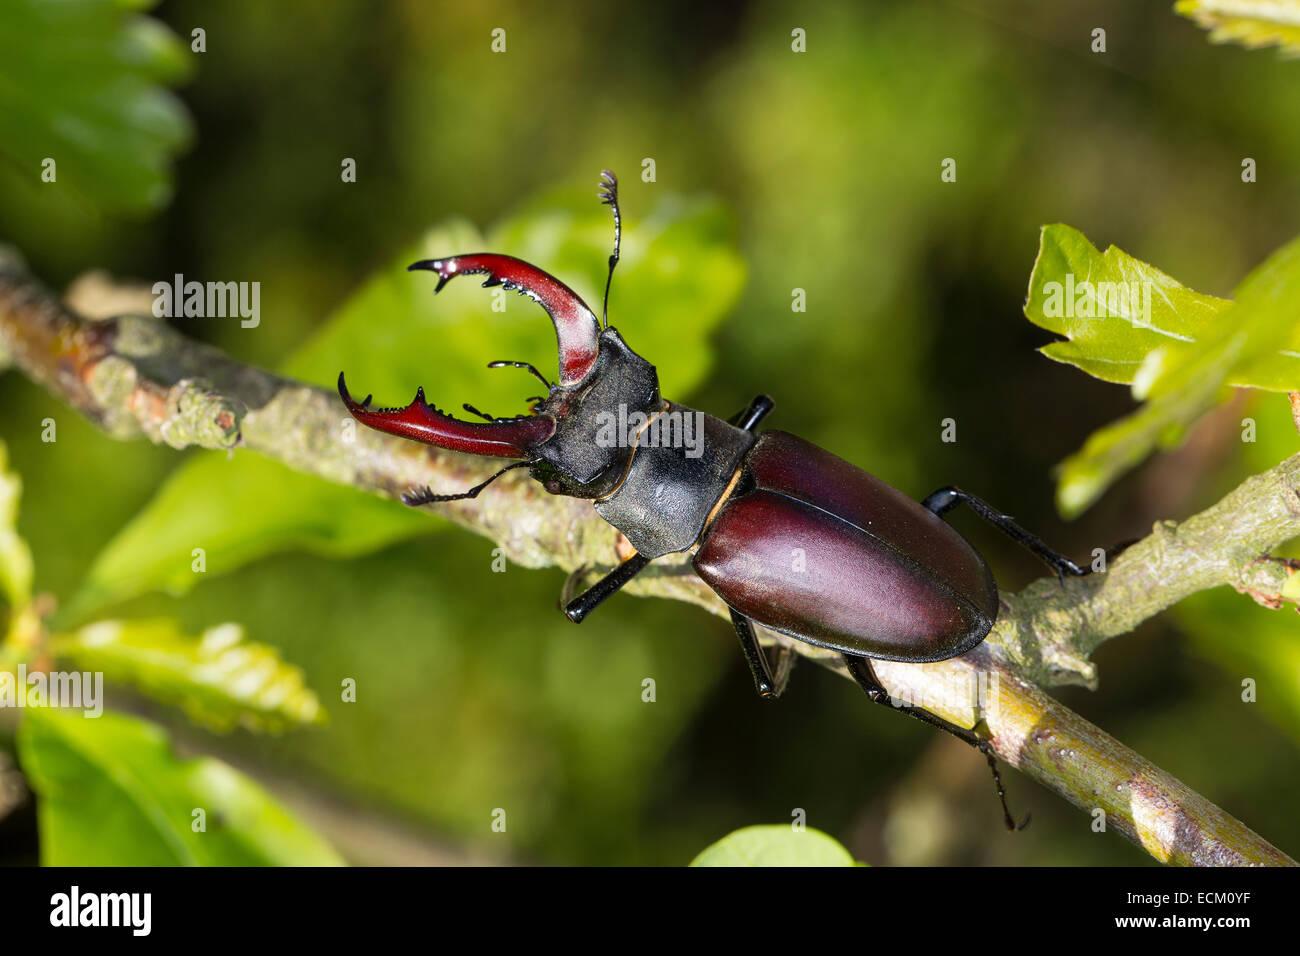 European stag beetle, stag-beetle, male, Hirschkäfer, Männchen, Lucanus cervus, Schröter, Lucanidae, Stag beetles Stock Photo